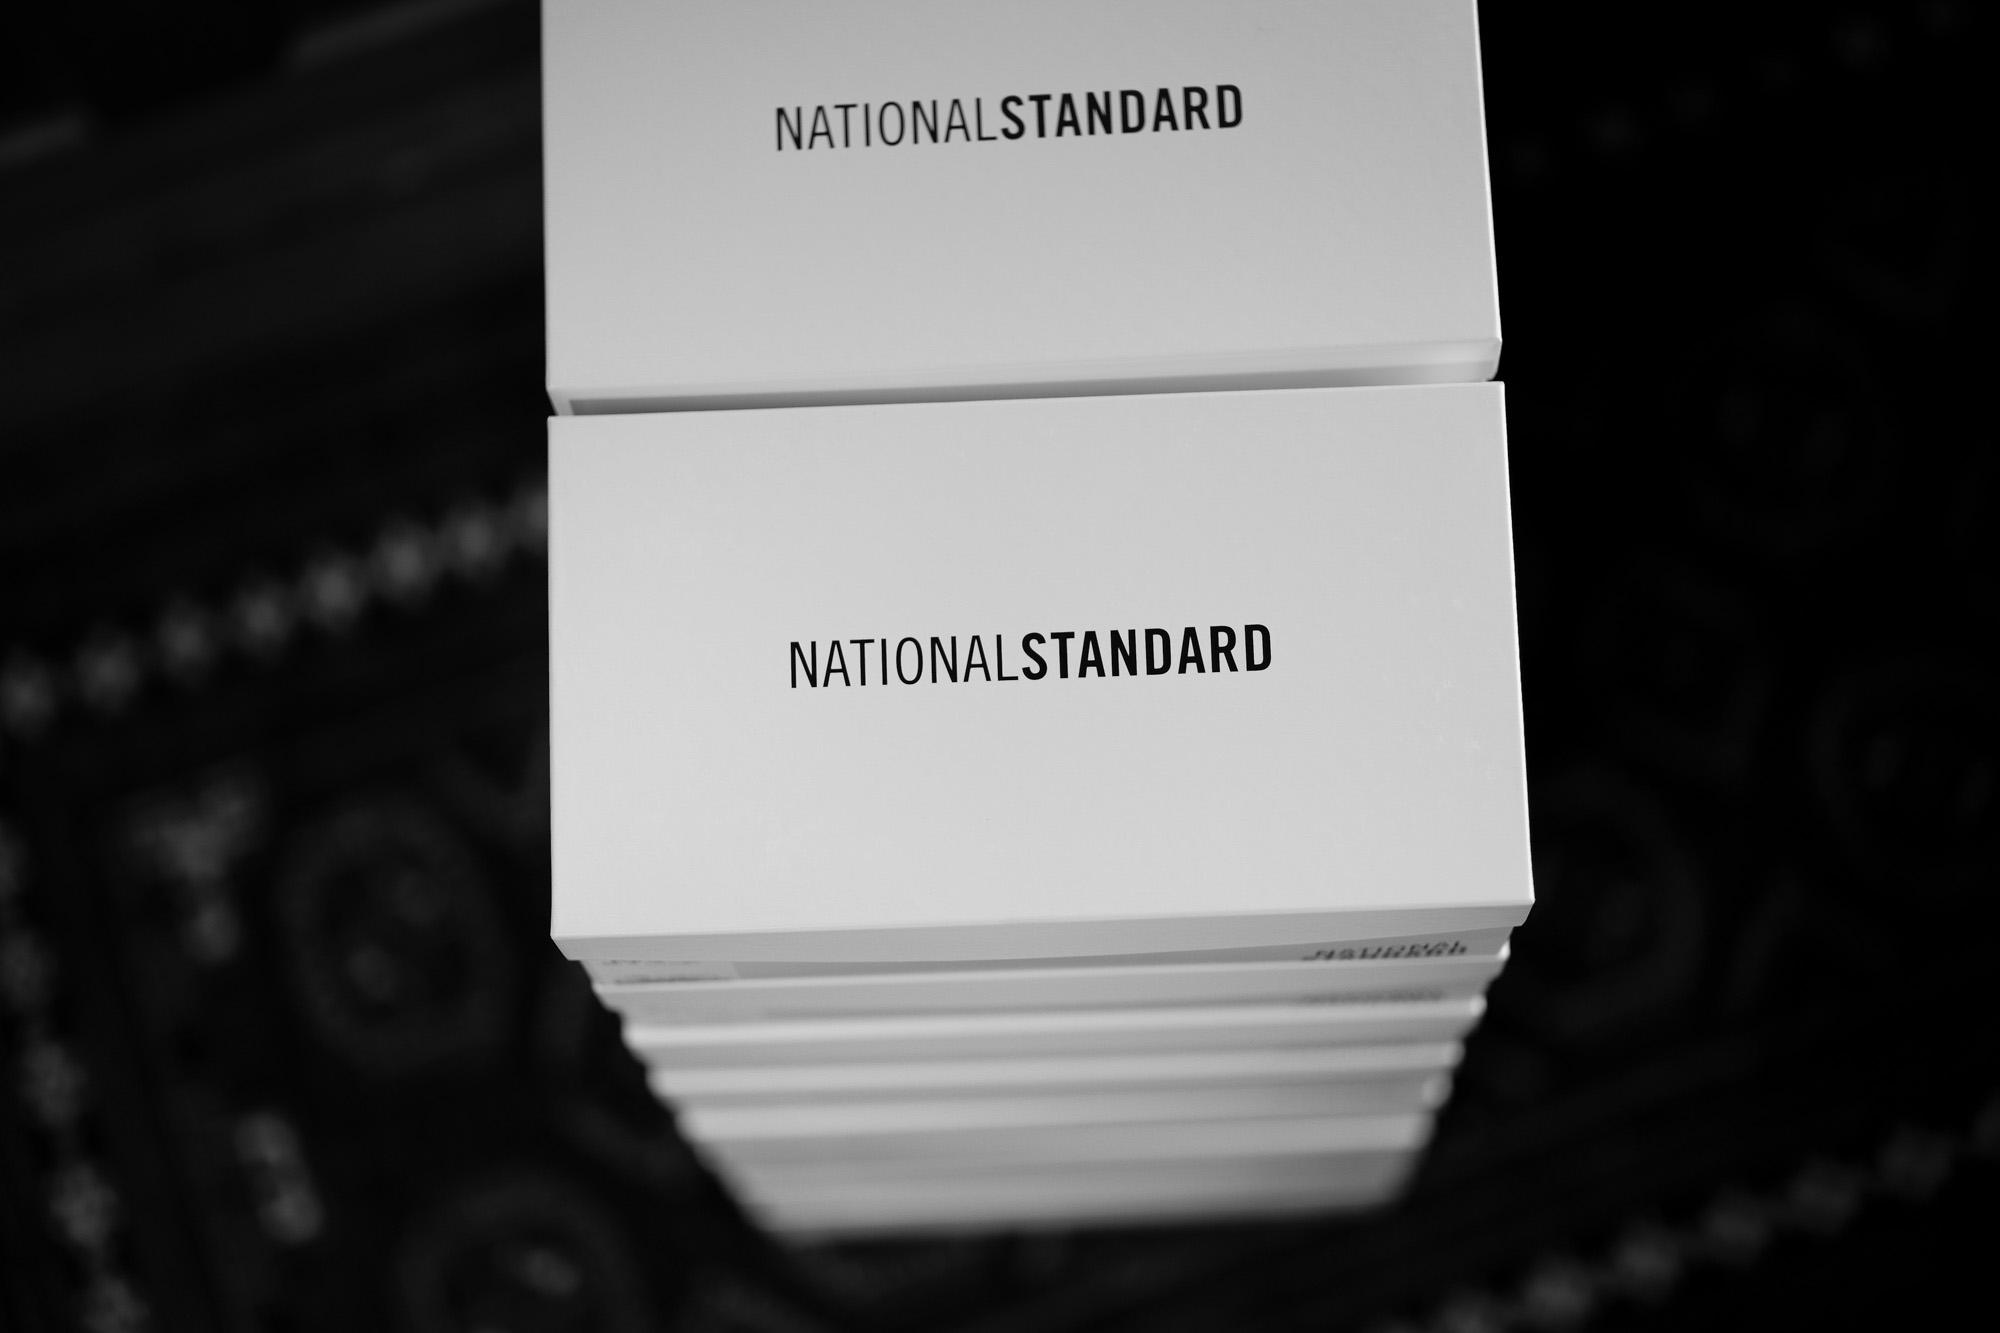 NATIONAL STANDARD (ナショナルスタンダード) EDITION 3 ALL OVER (M03-WH-000) レザースニーカー WHITE (ホワイト・000) 2019 秋冬新作 愛知 名古屋 altoediritto アルトエデリット nationalstandard 白スニーカー